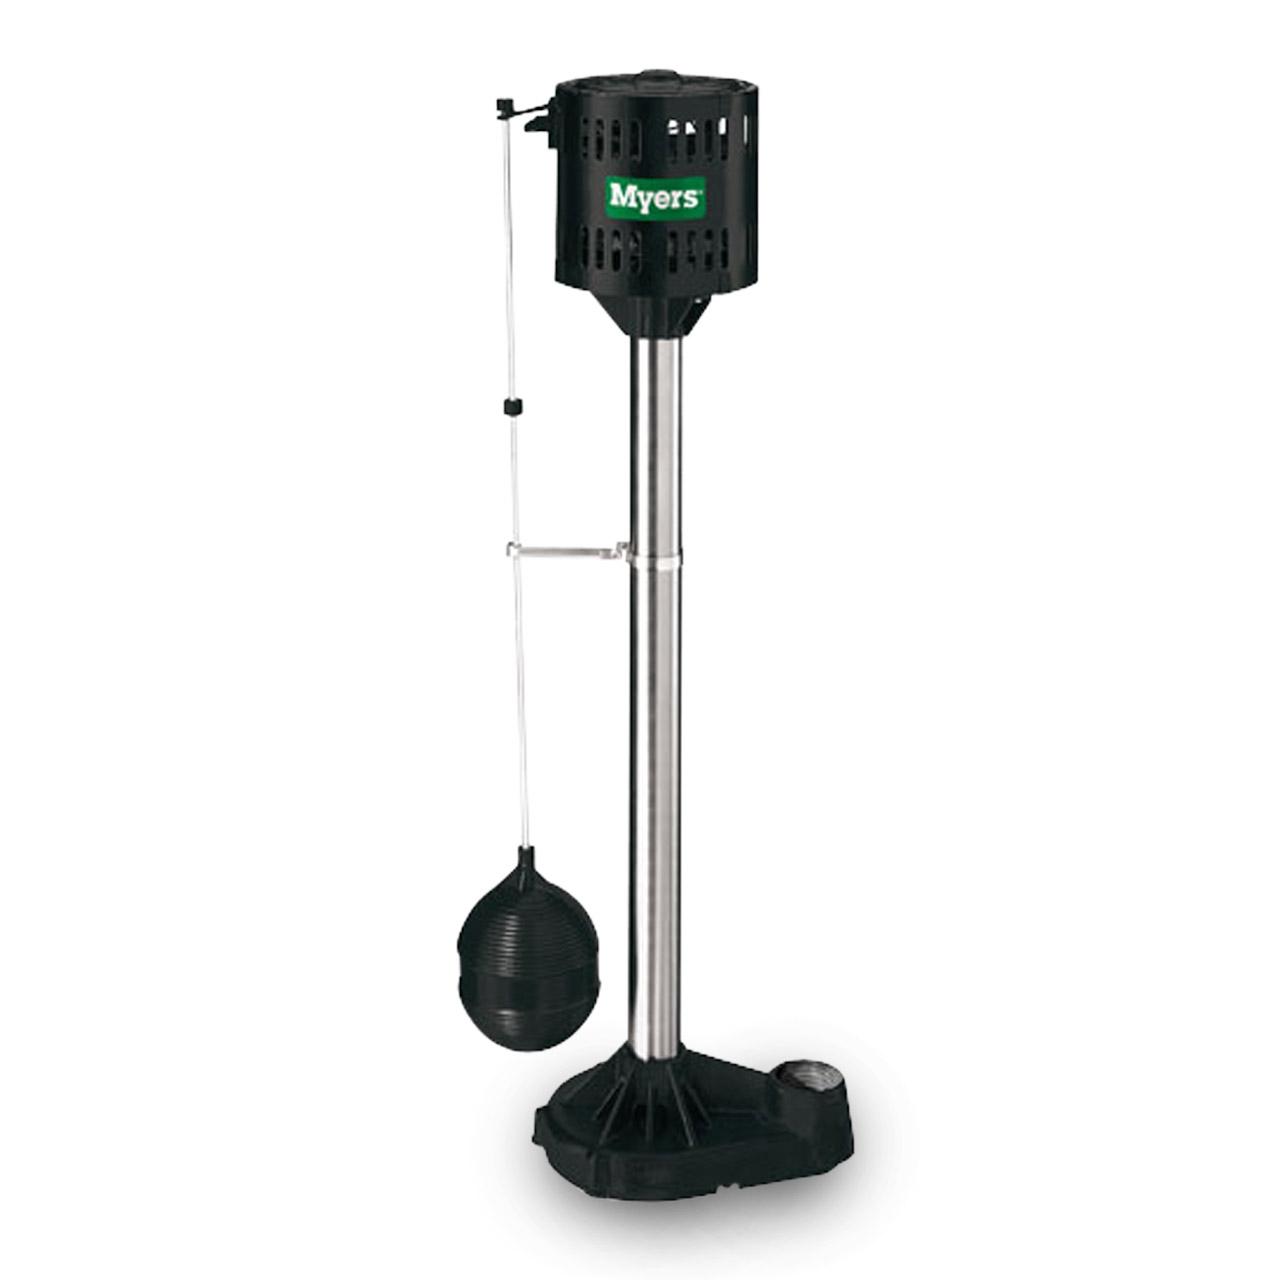 Myers Myers Mcsp3i Pedestal Sump Pump 1 3 Hp 115v Cast